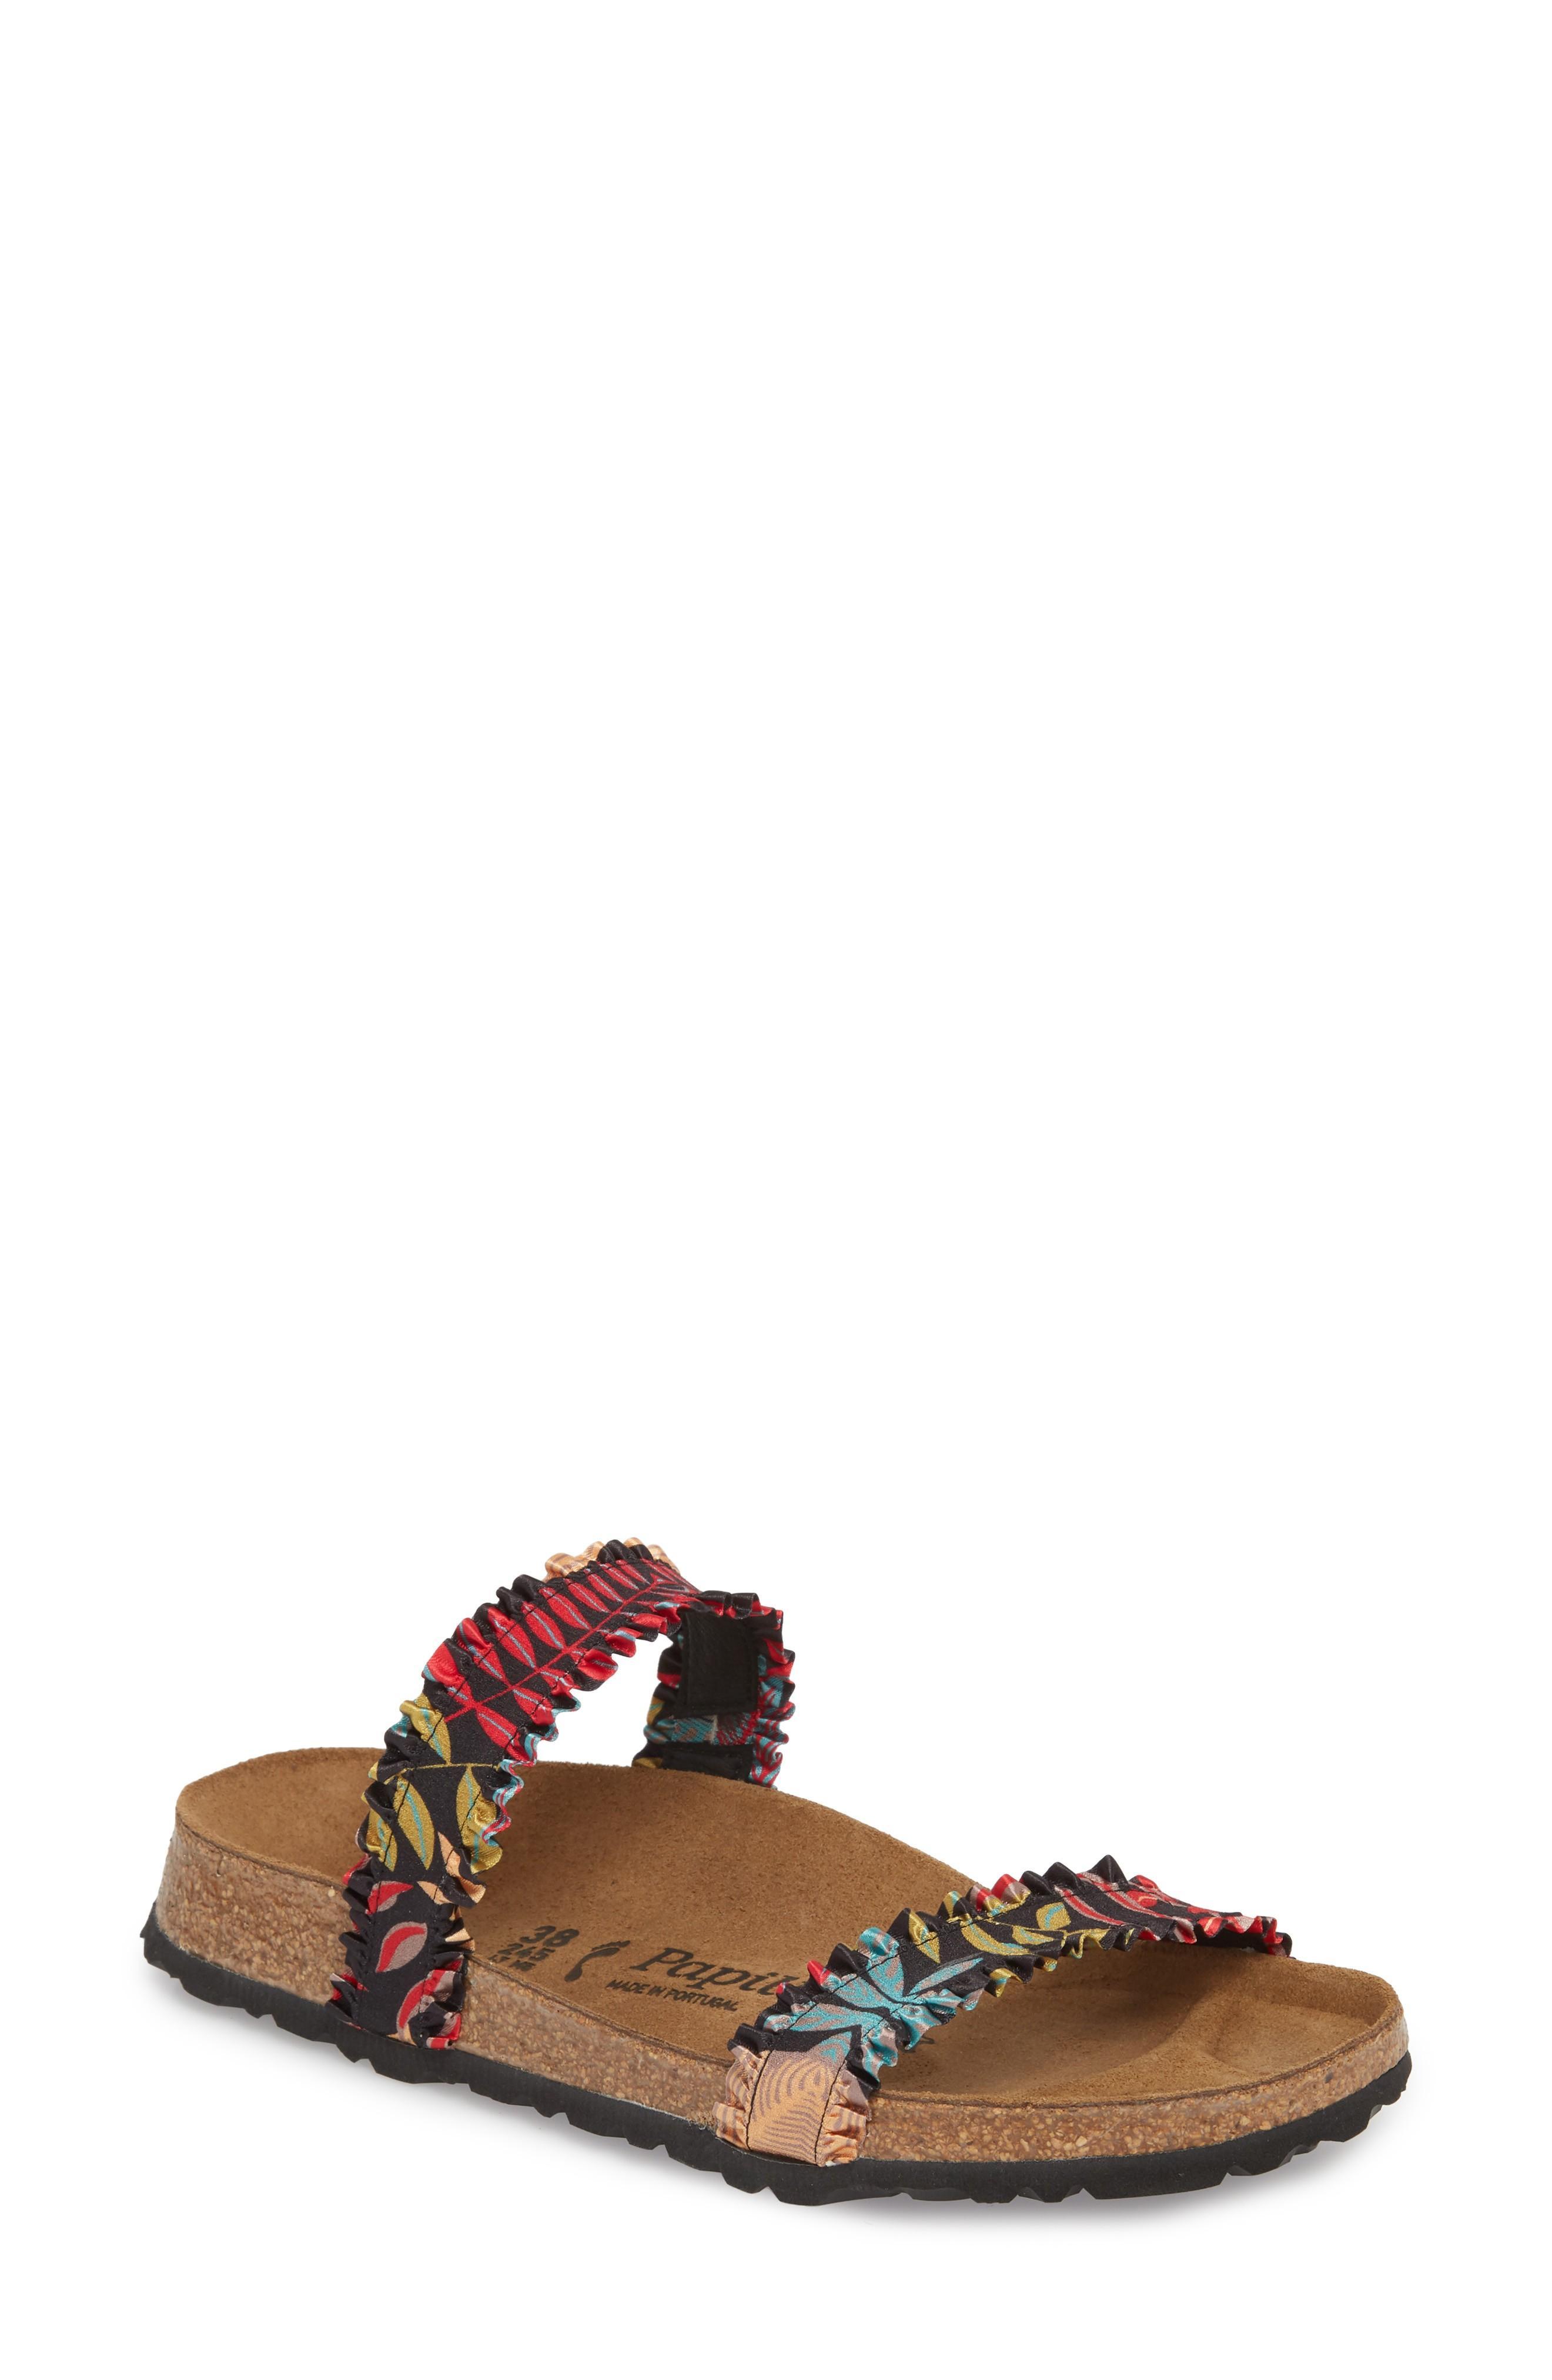 Birkenstock Curacao Slide Sandal In Flower Frill Black Fabric